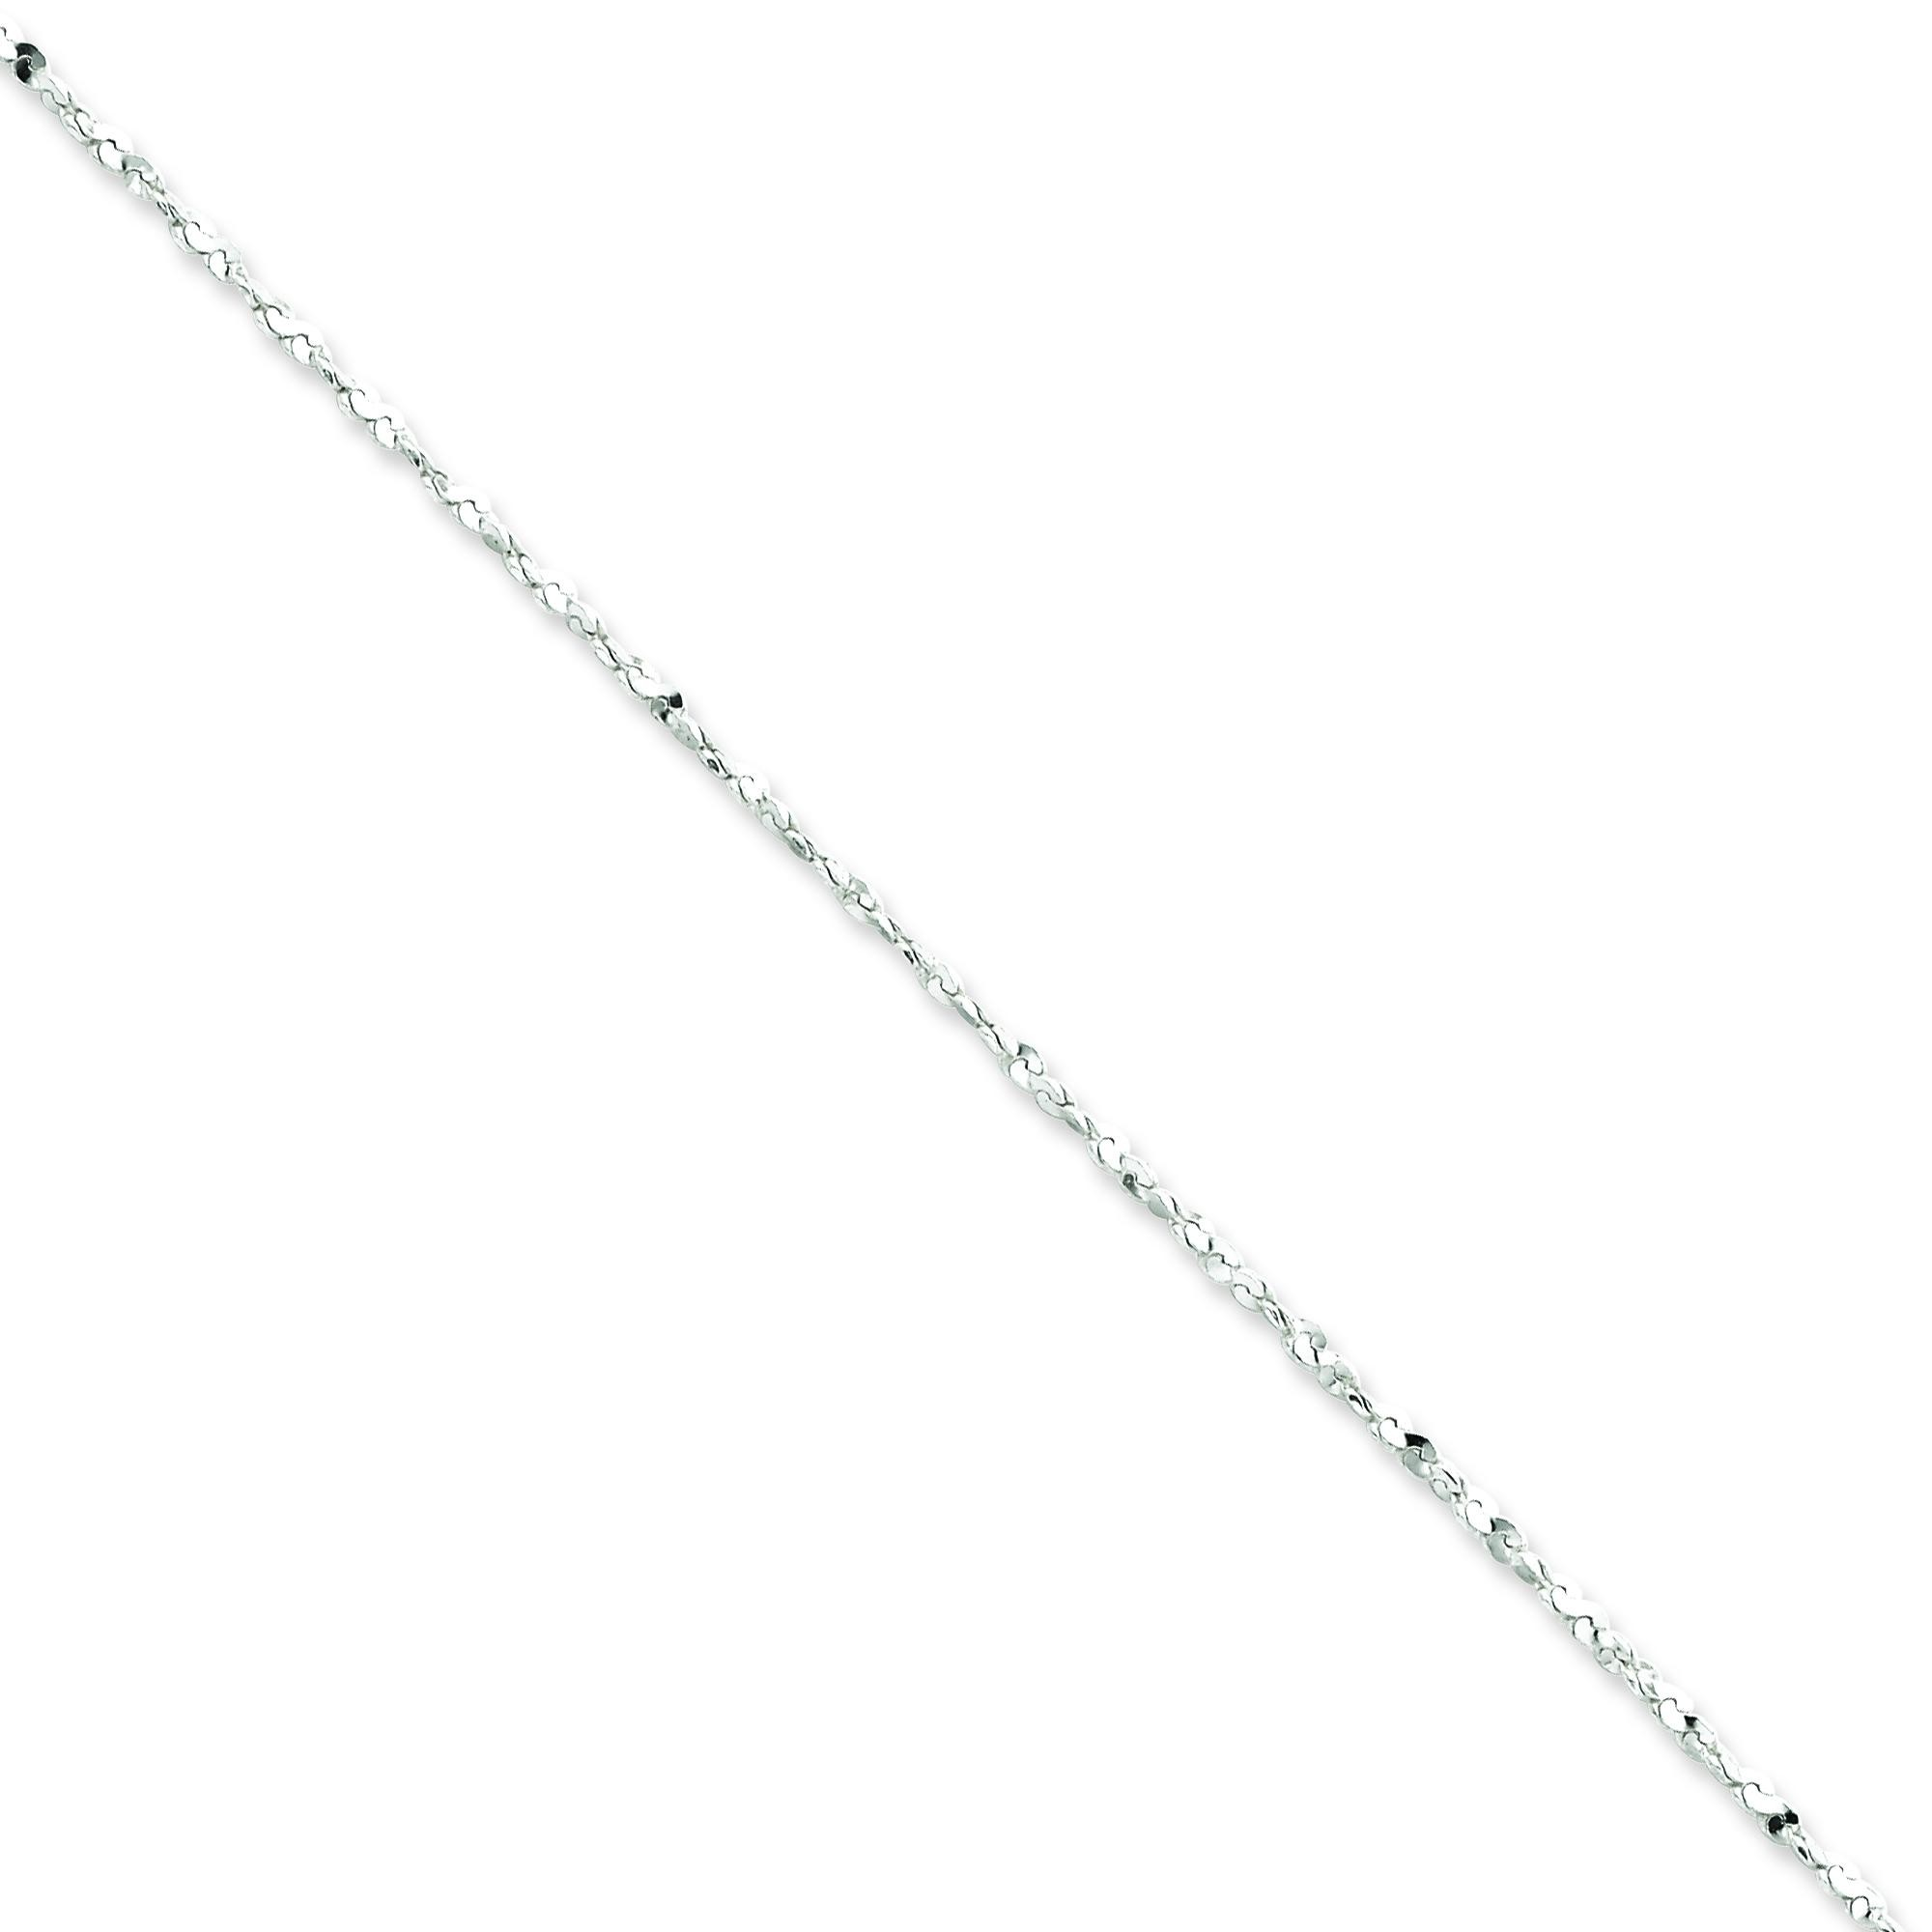 Sterling Silver 16 inch 1.80 mm Twisted Serpentine Fancy Choker Necklace